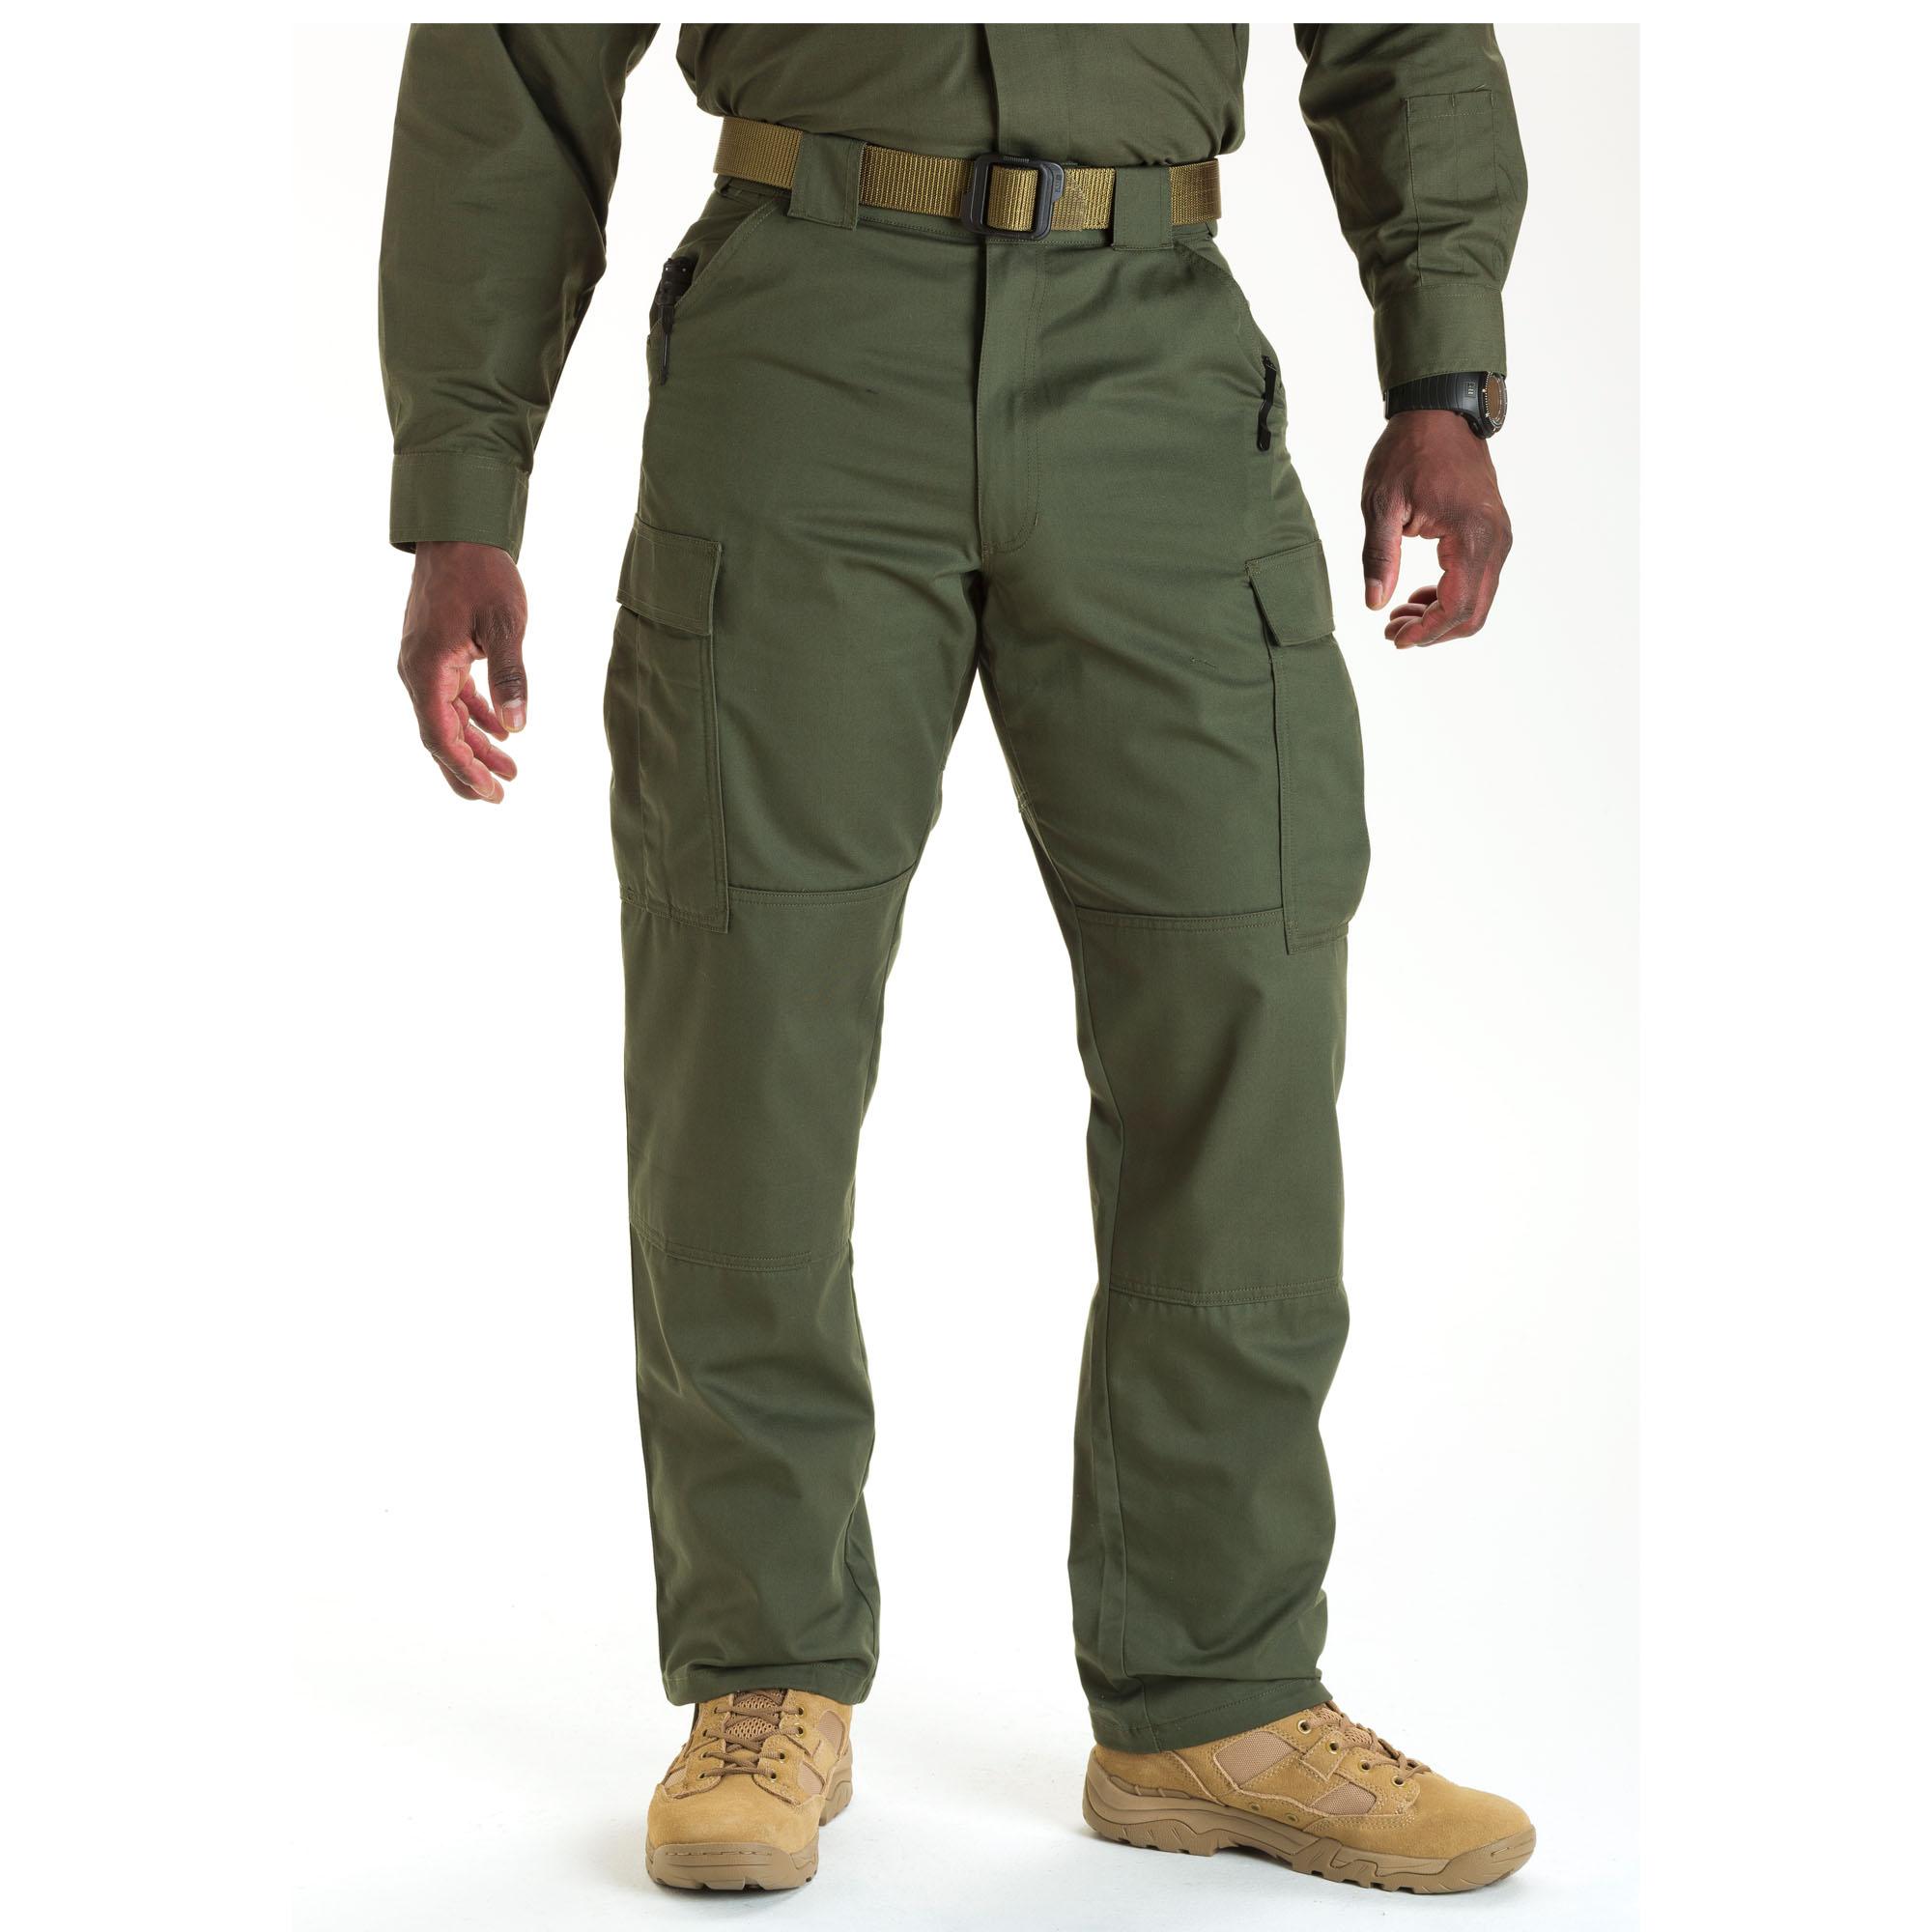 TDU Pants - Twill-5.11 Tactical